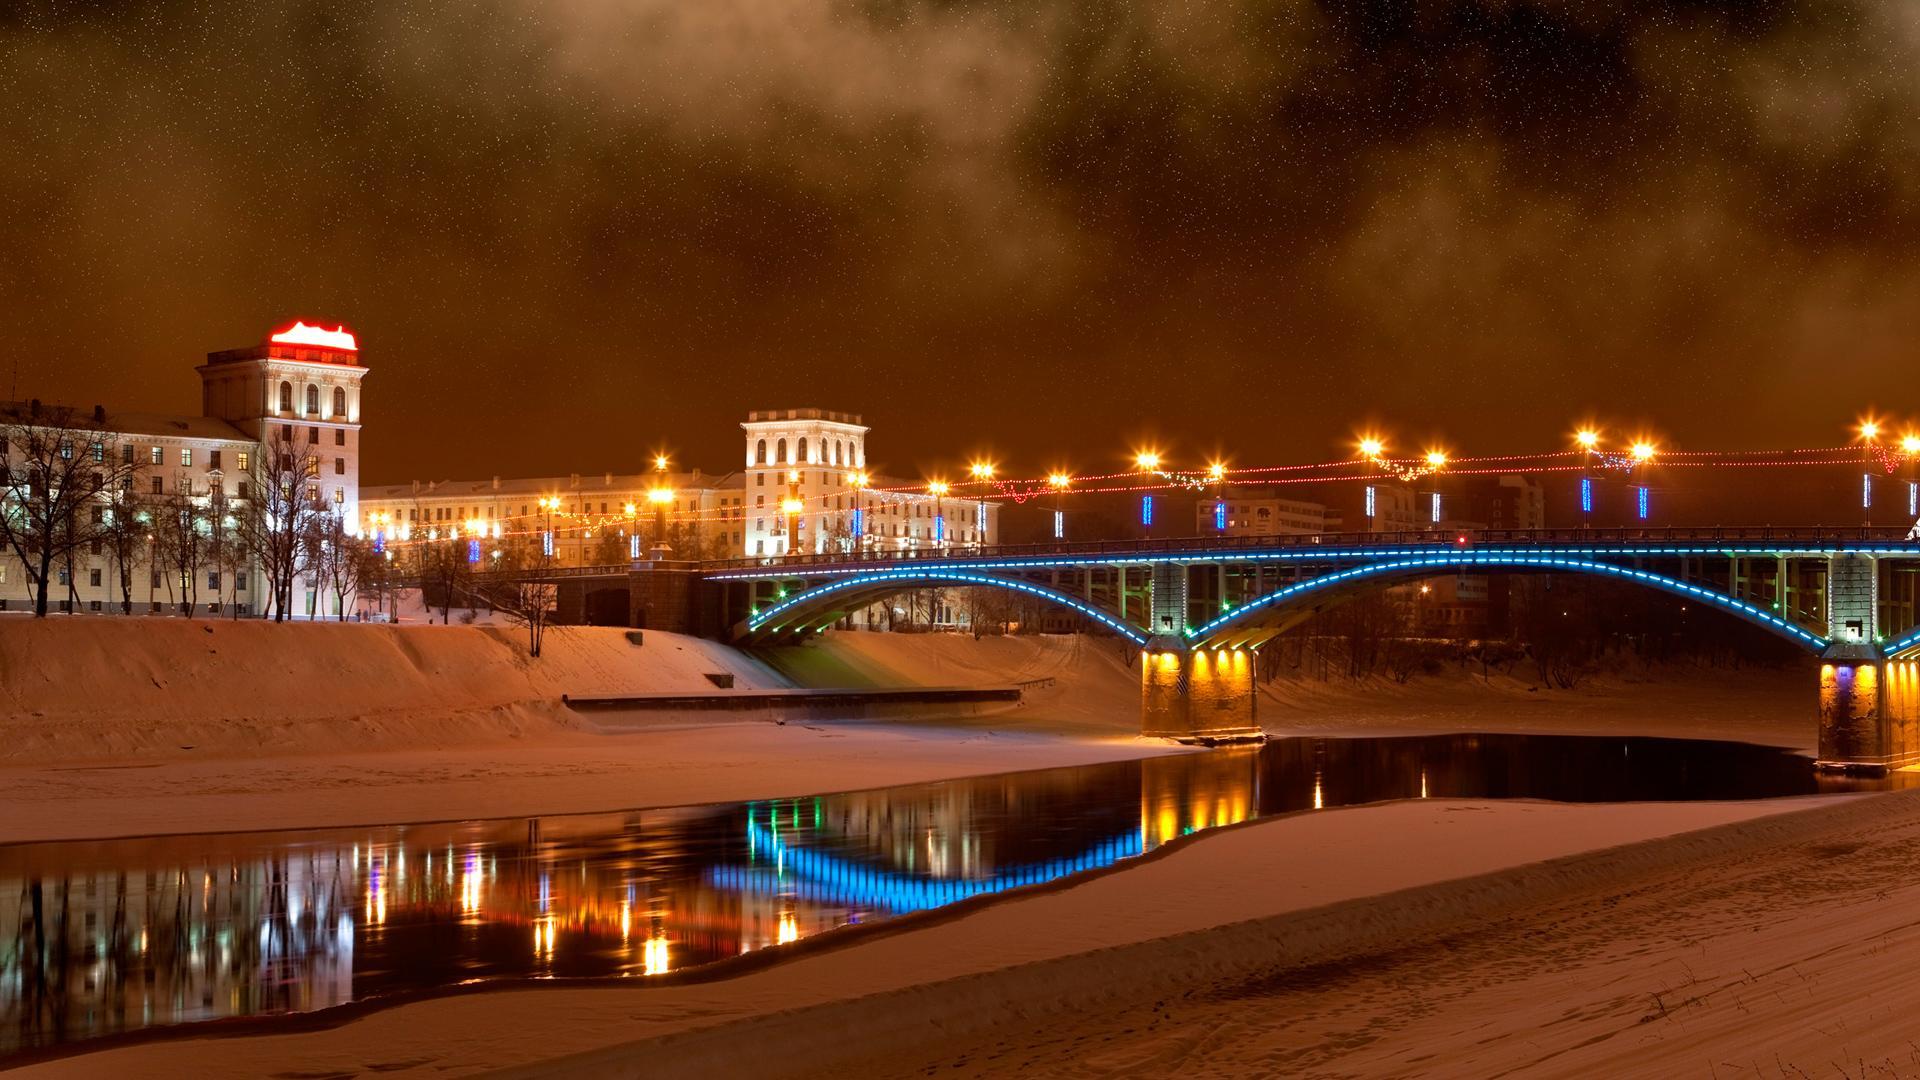 lightning bridge in a cold winter night